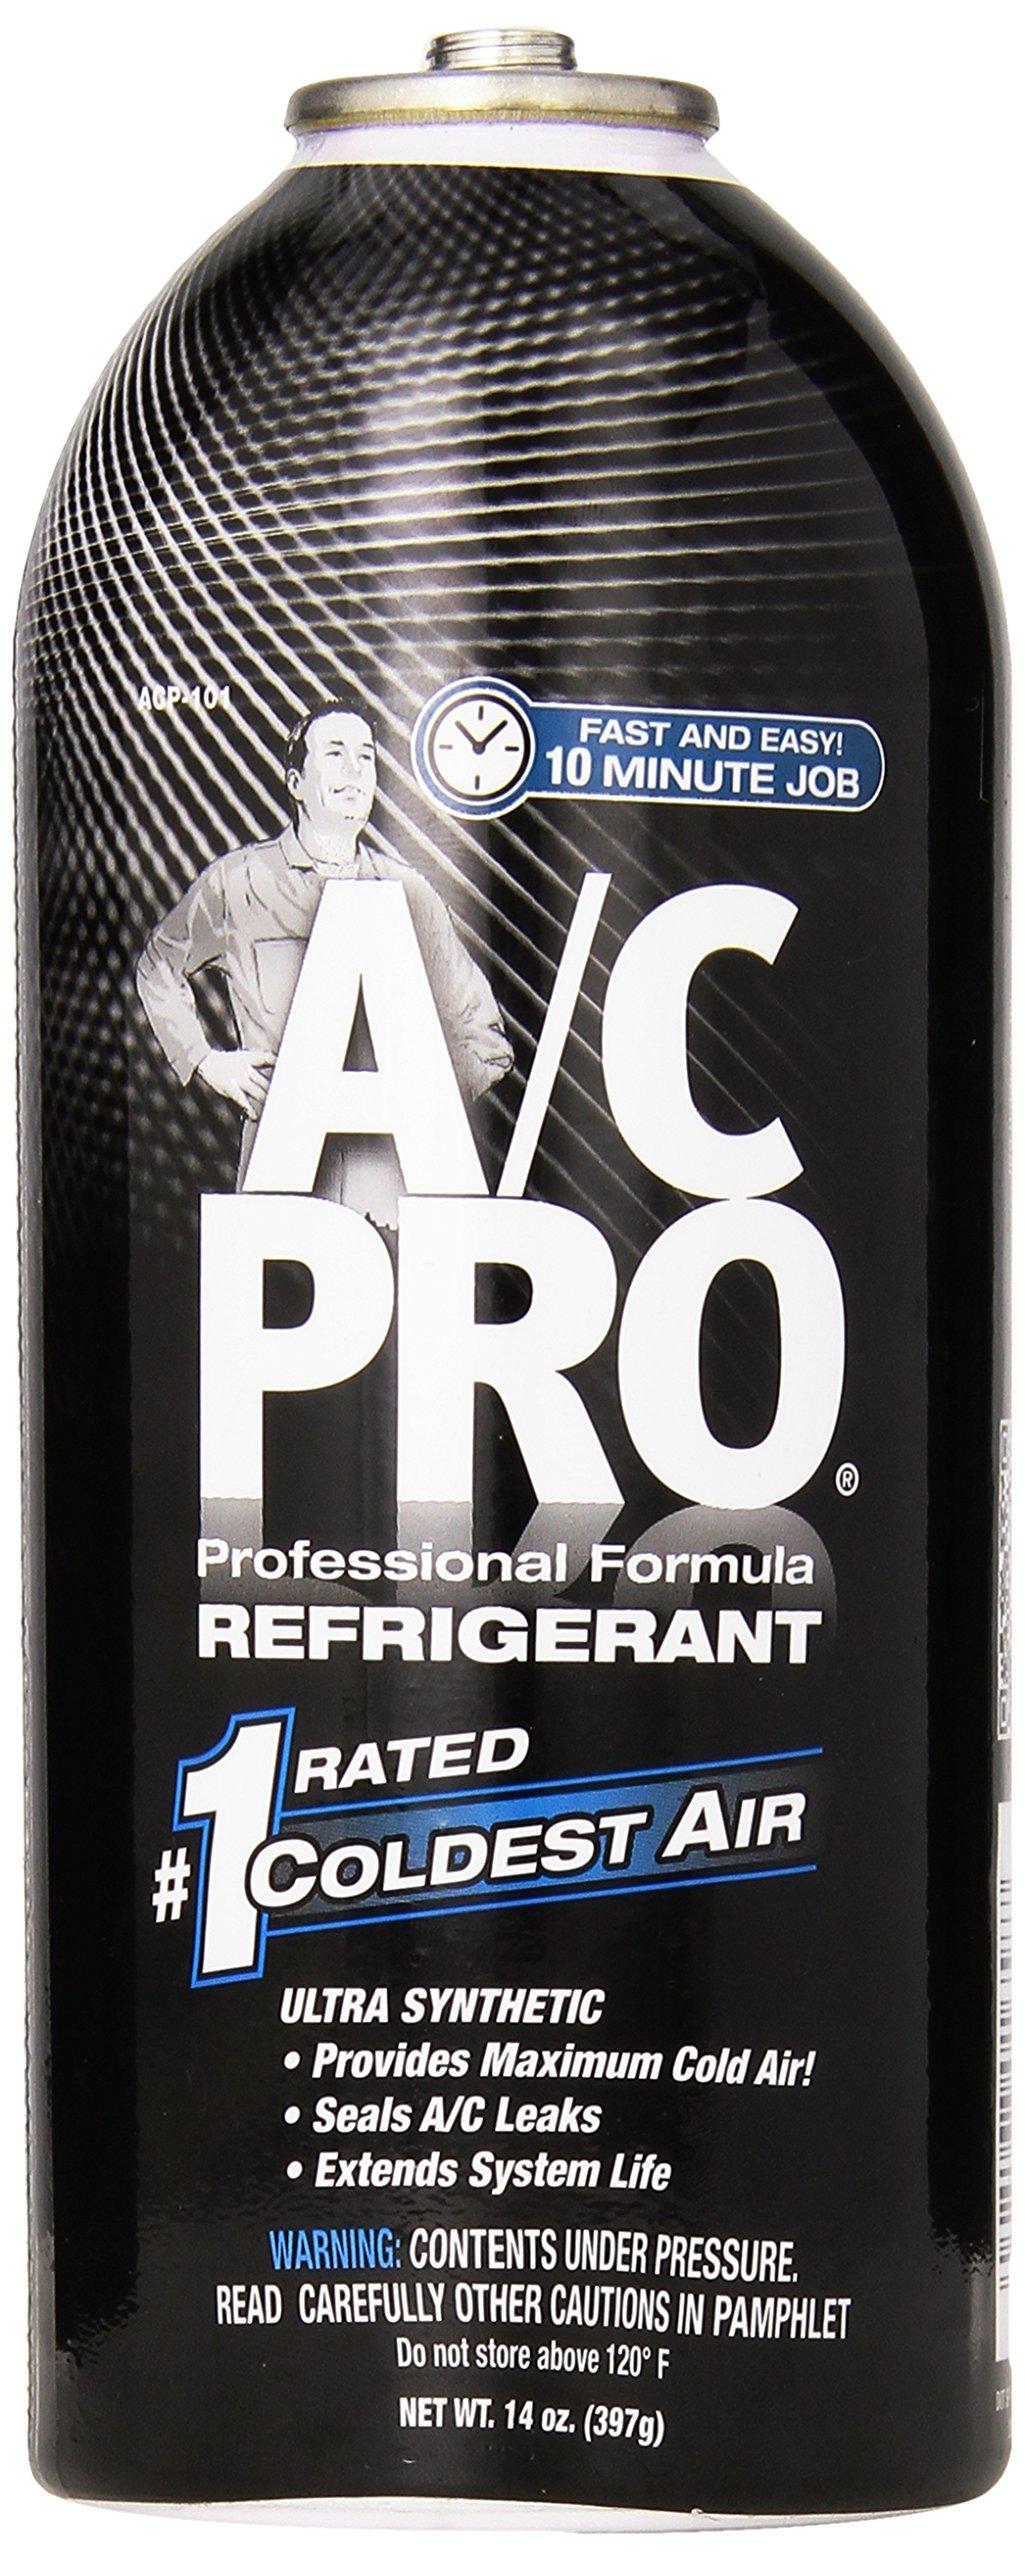 Interdynamics A/C PRO ACP-101 R-134a Ultra Synthetic A/C Refrigerant Refill (14 oz)